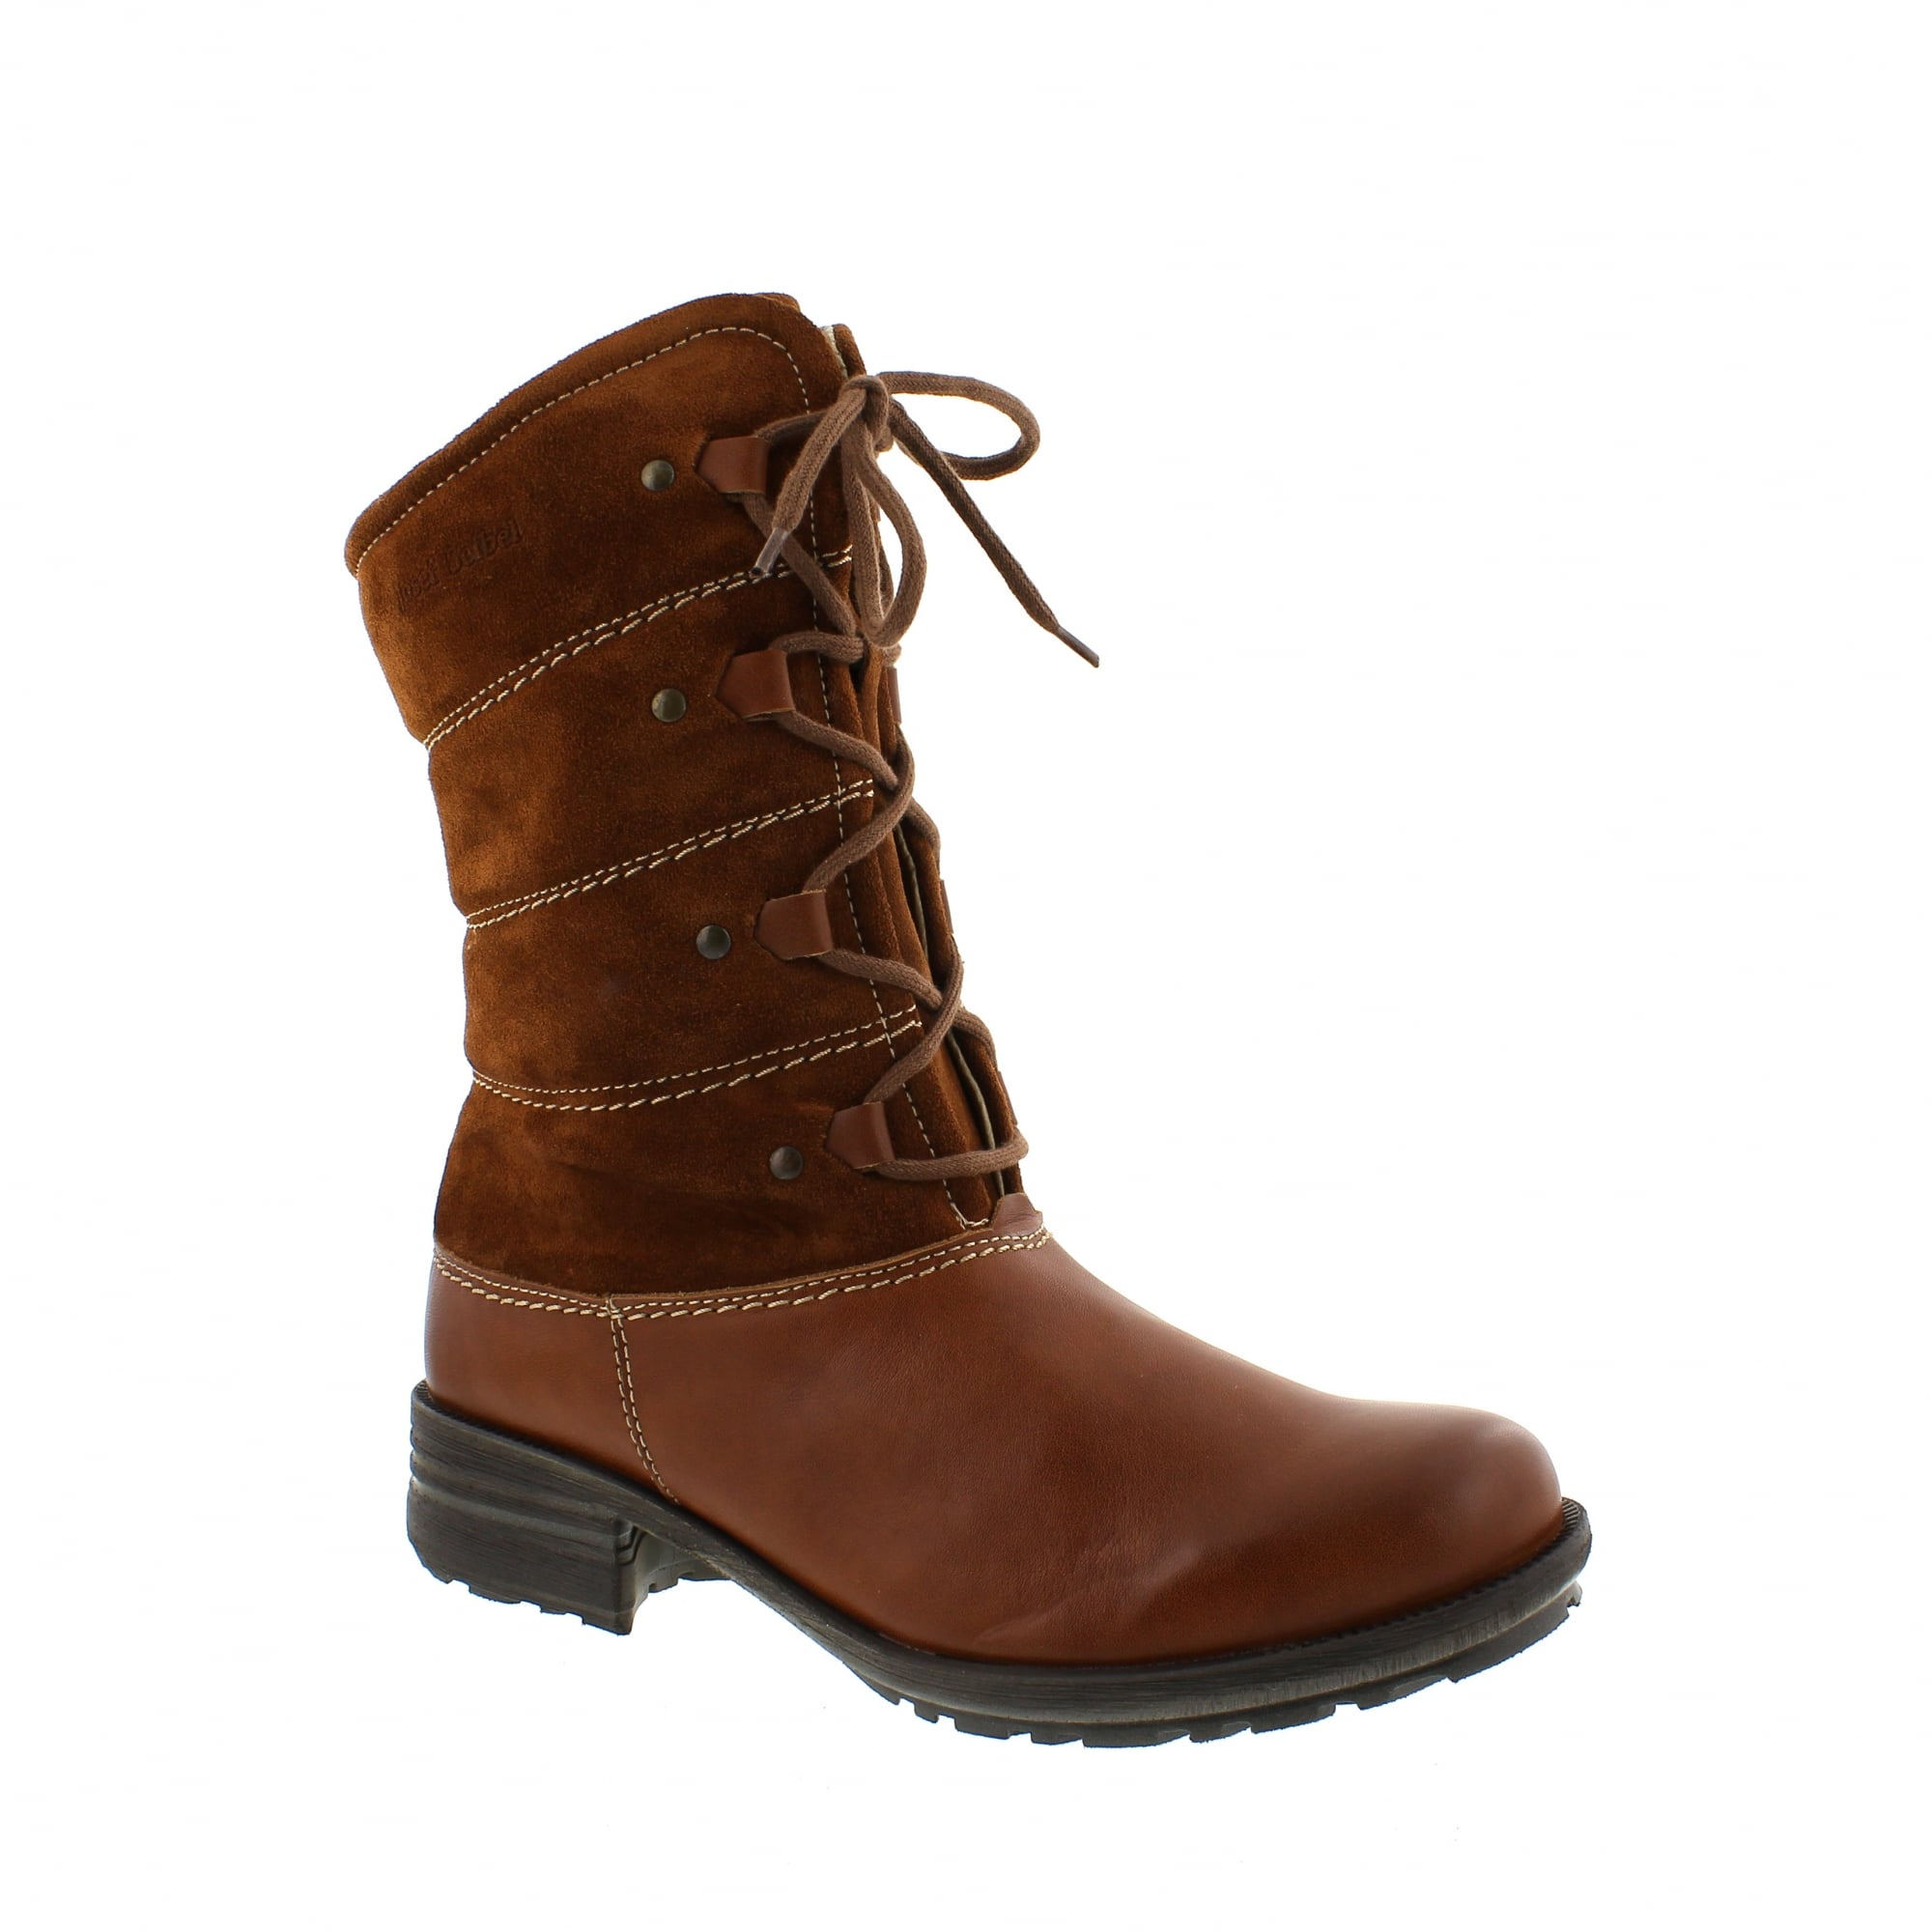 Josef Seibel New Palmira 93772PL782345 Womens Mid Calf Boots